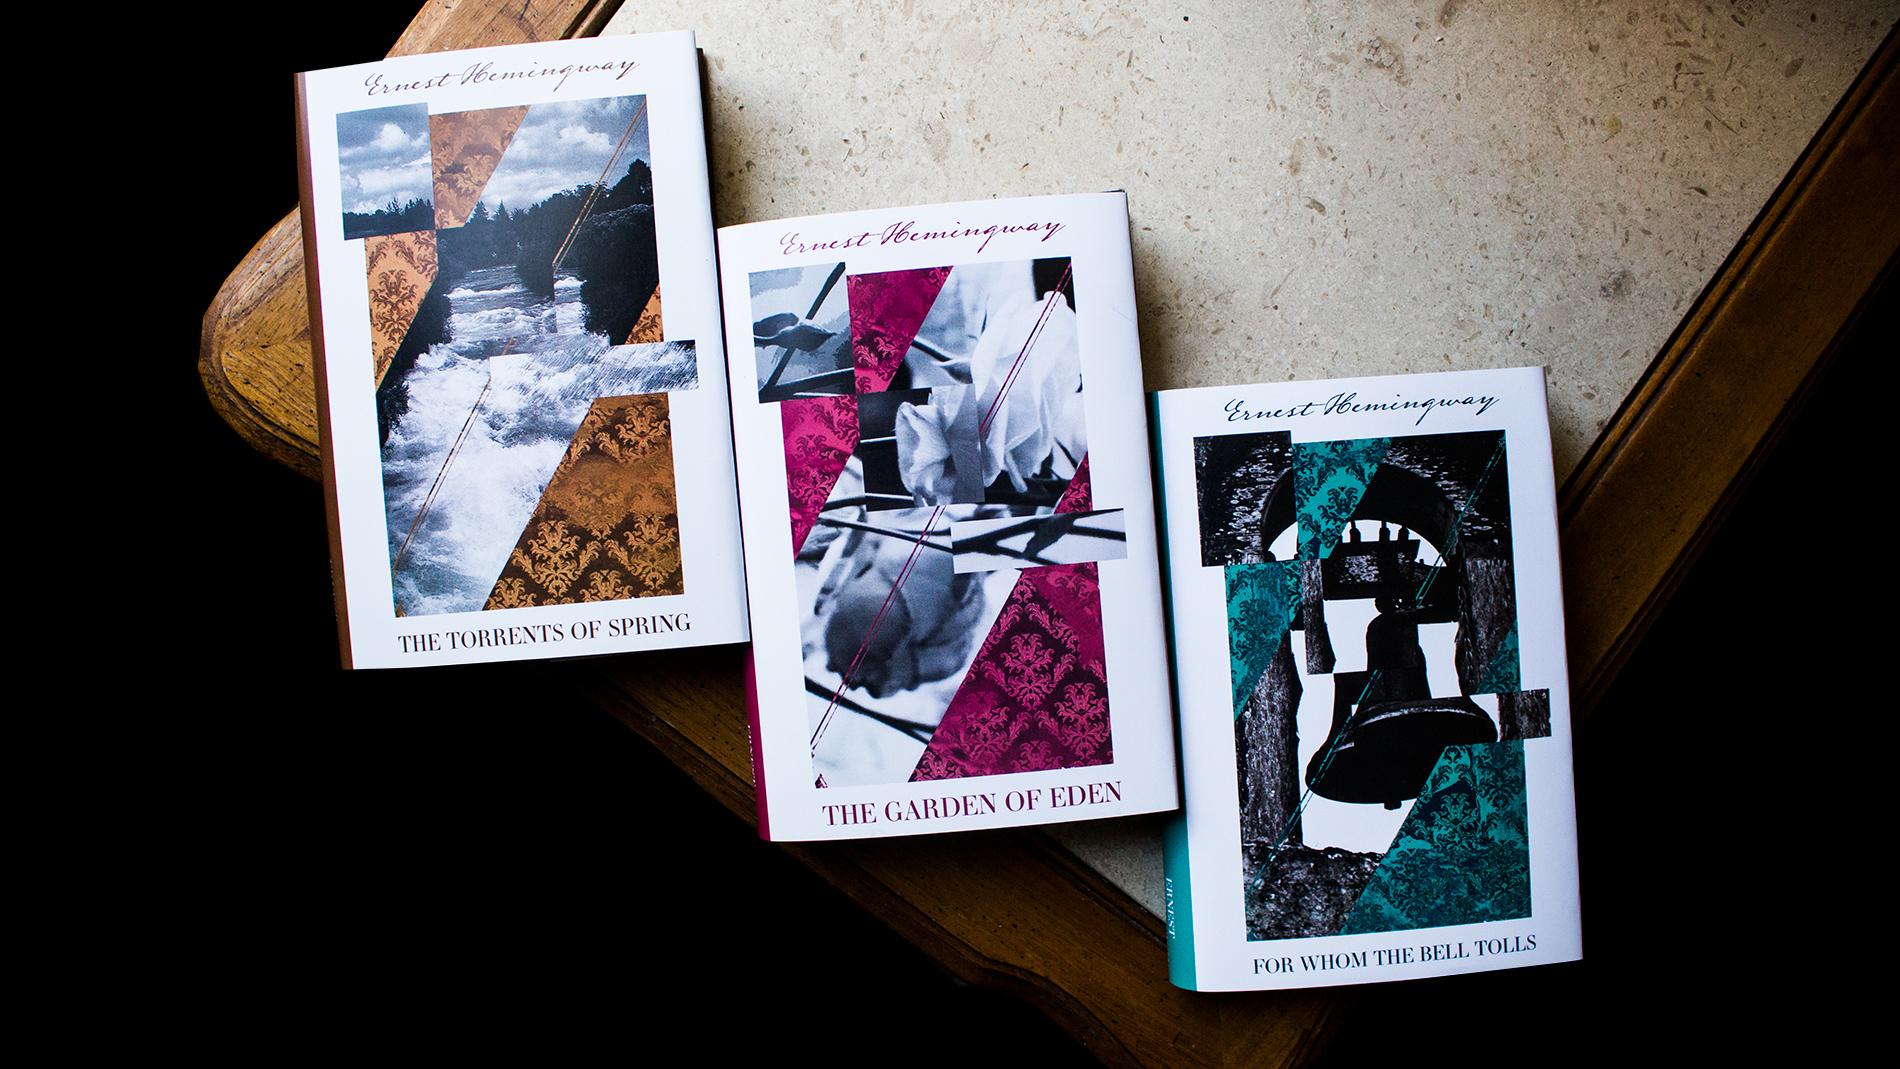 Ernest Hemingway Book Series 2017